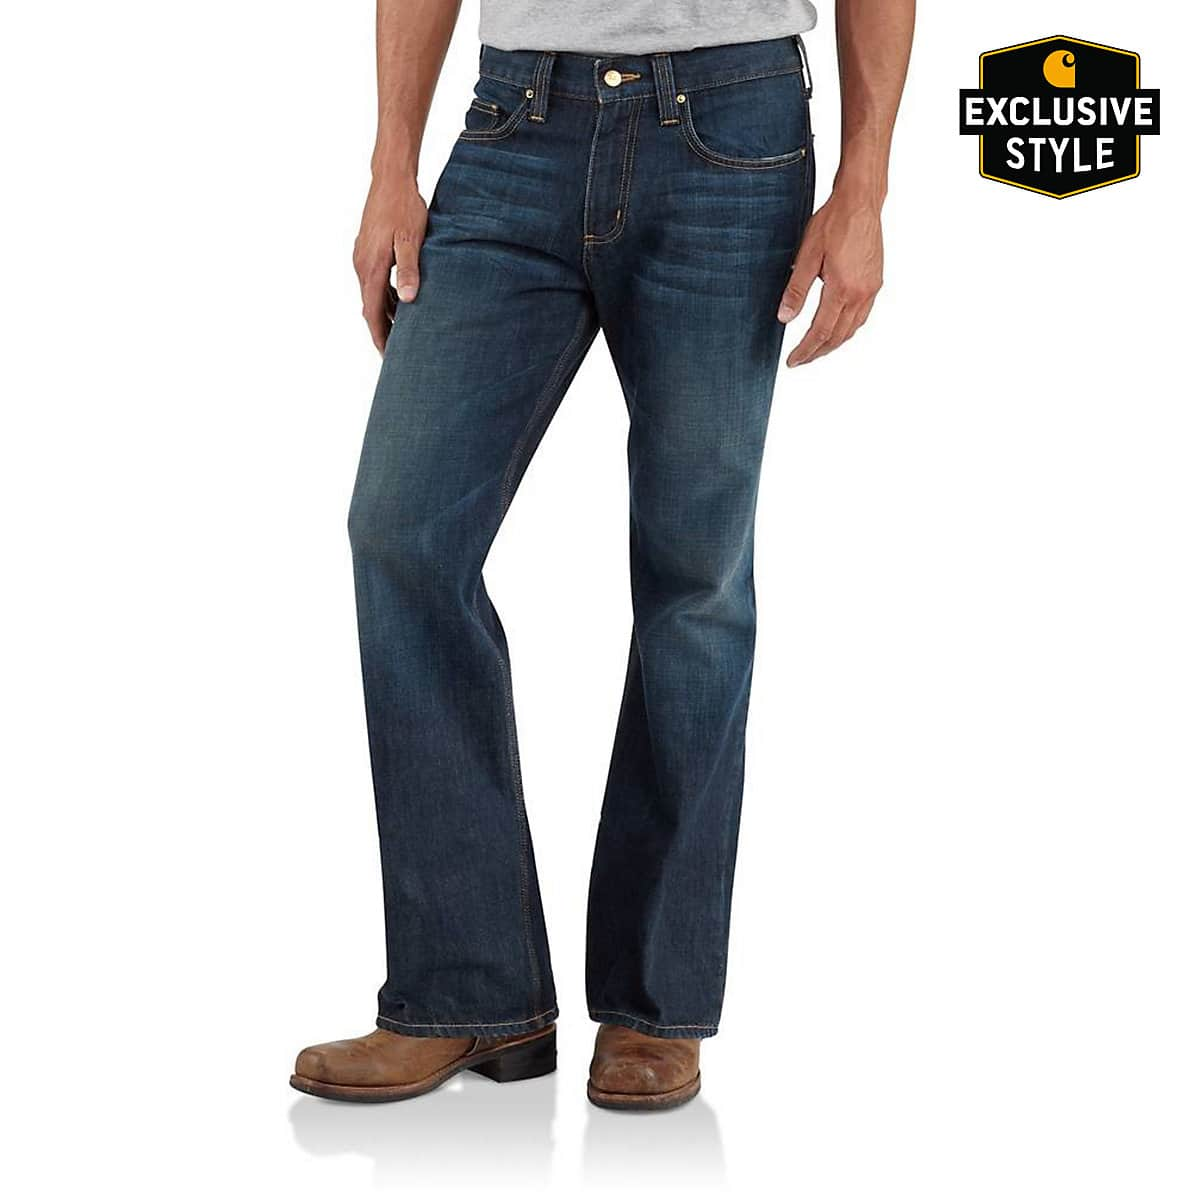 c1f68a44e417e6 Men's Series 1889® Relaxed-Fit Boot Cut Jean B310 | Carhartt